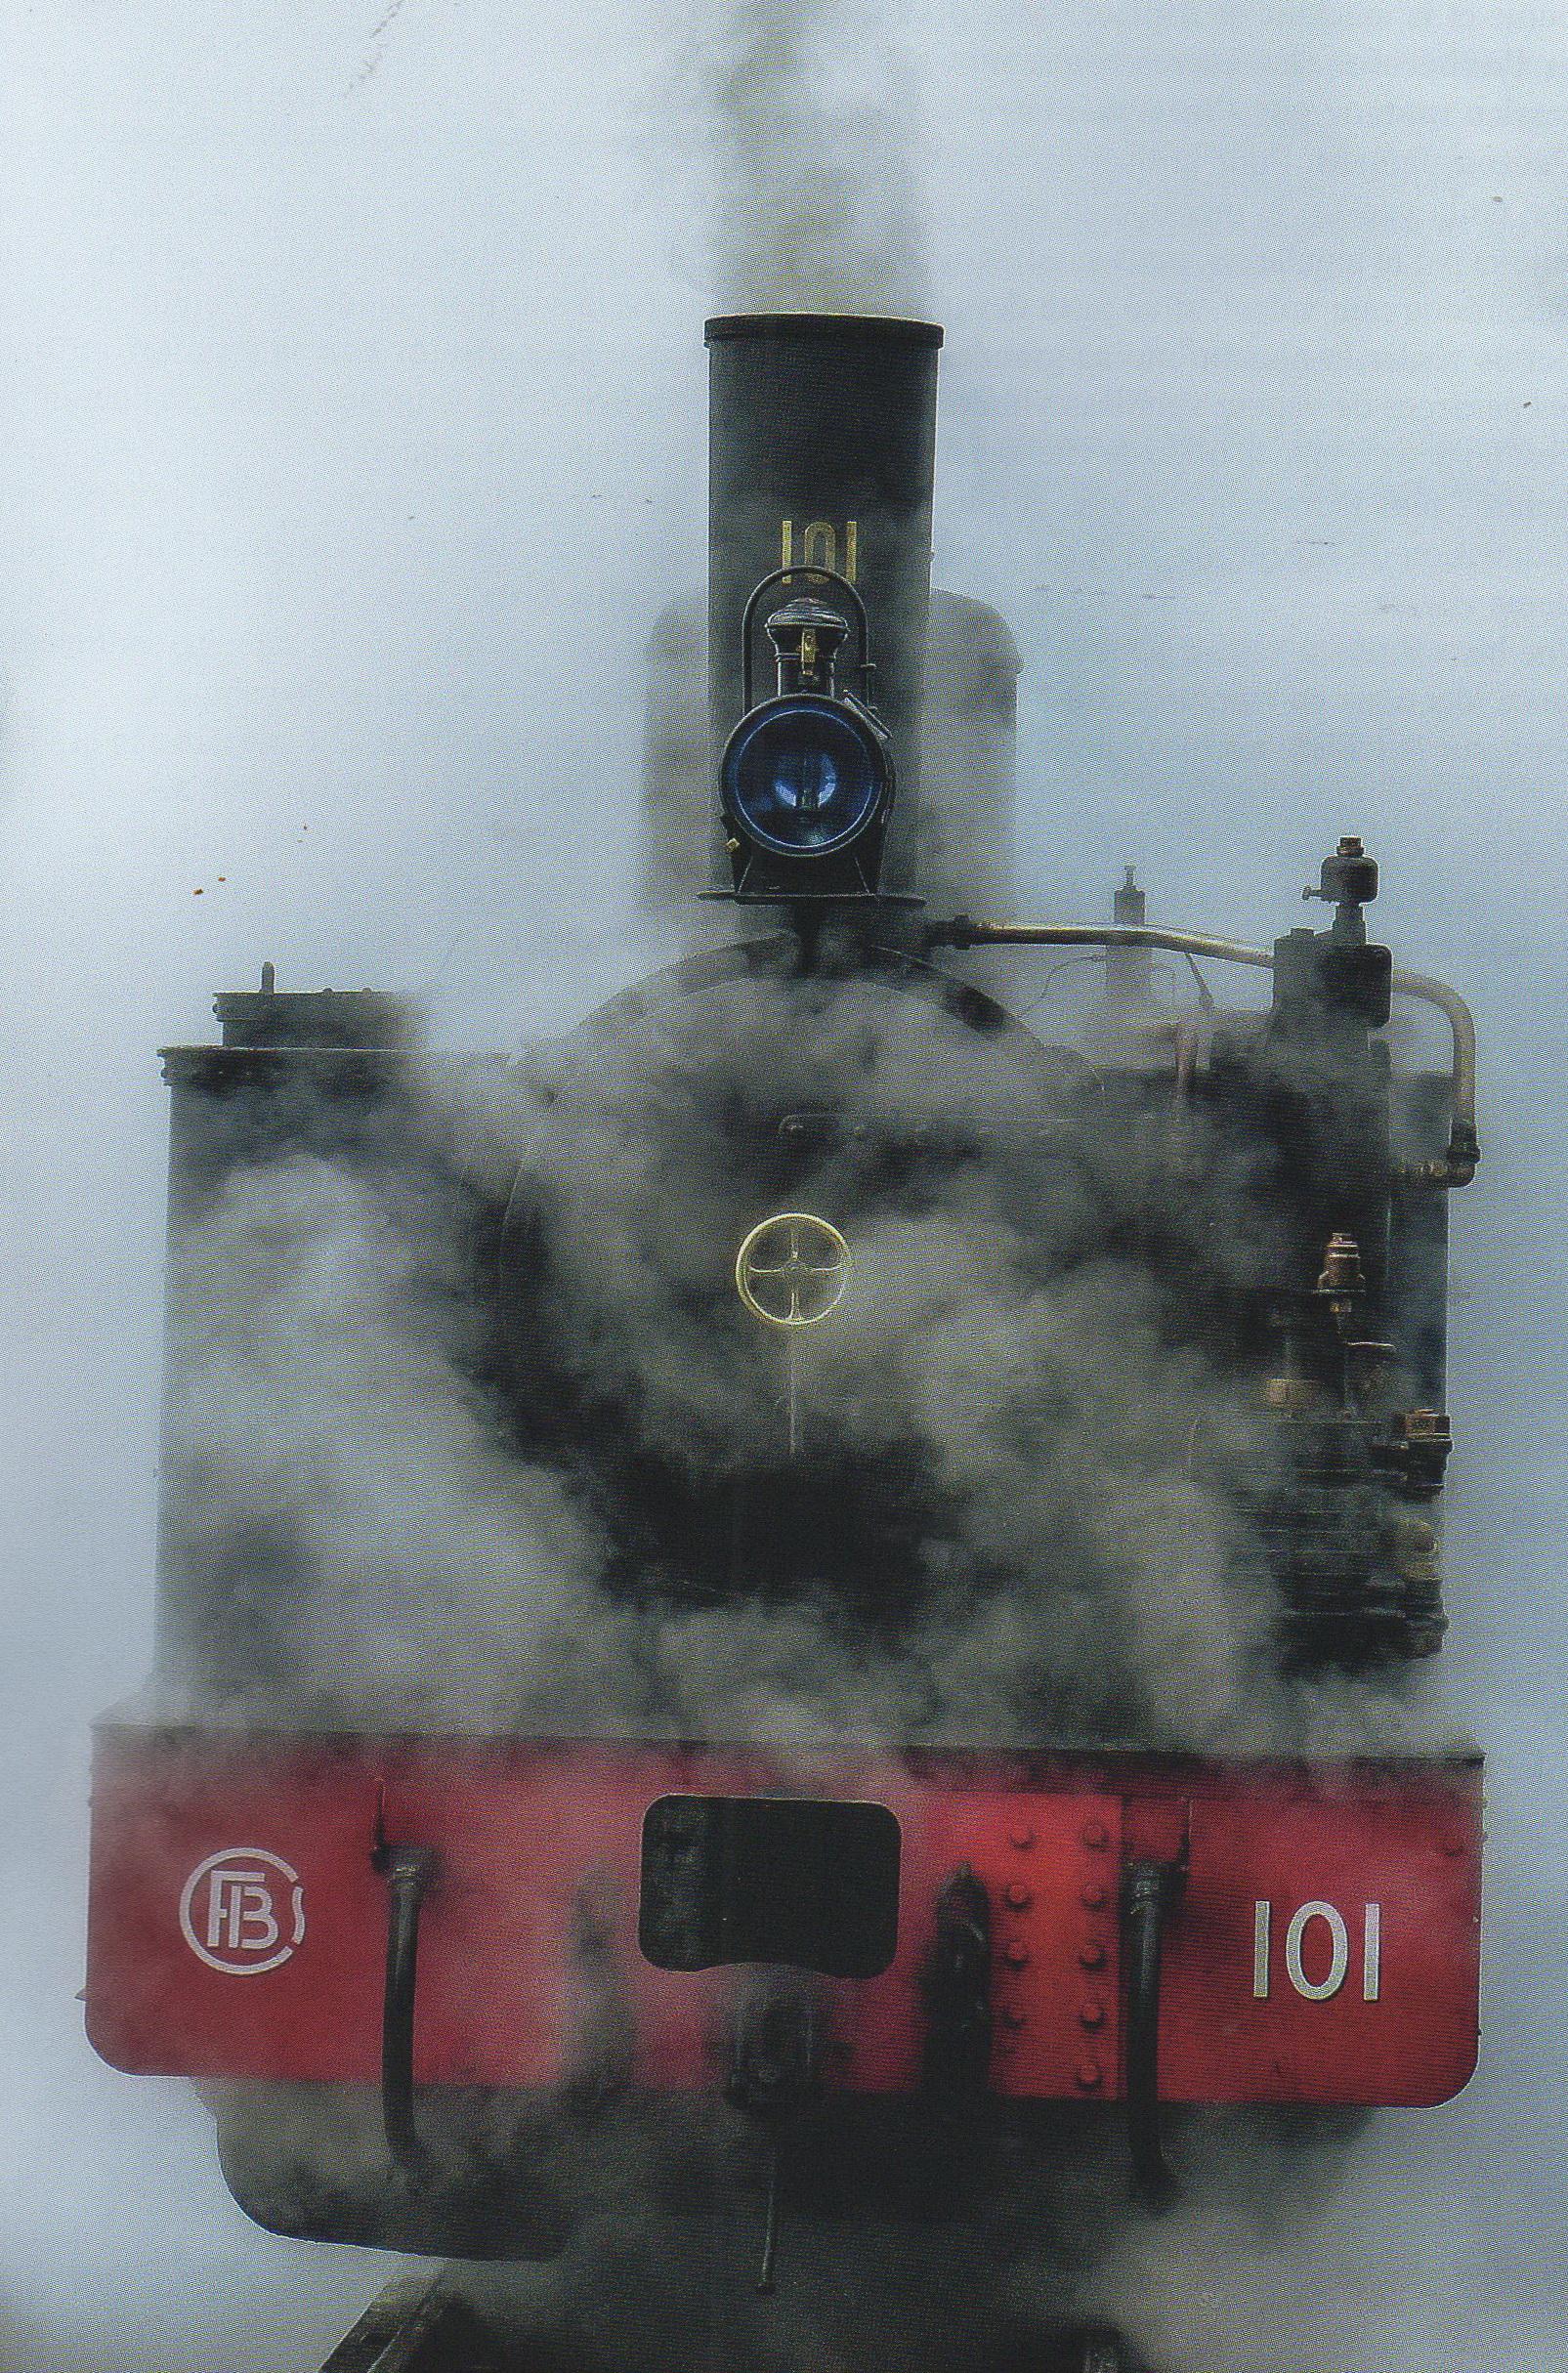 La loco 101 en Somme img187